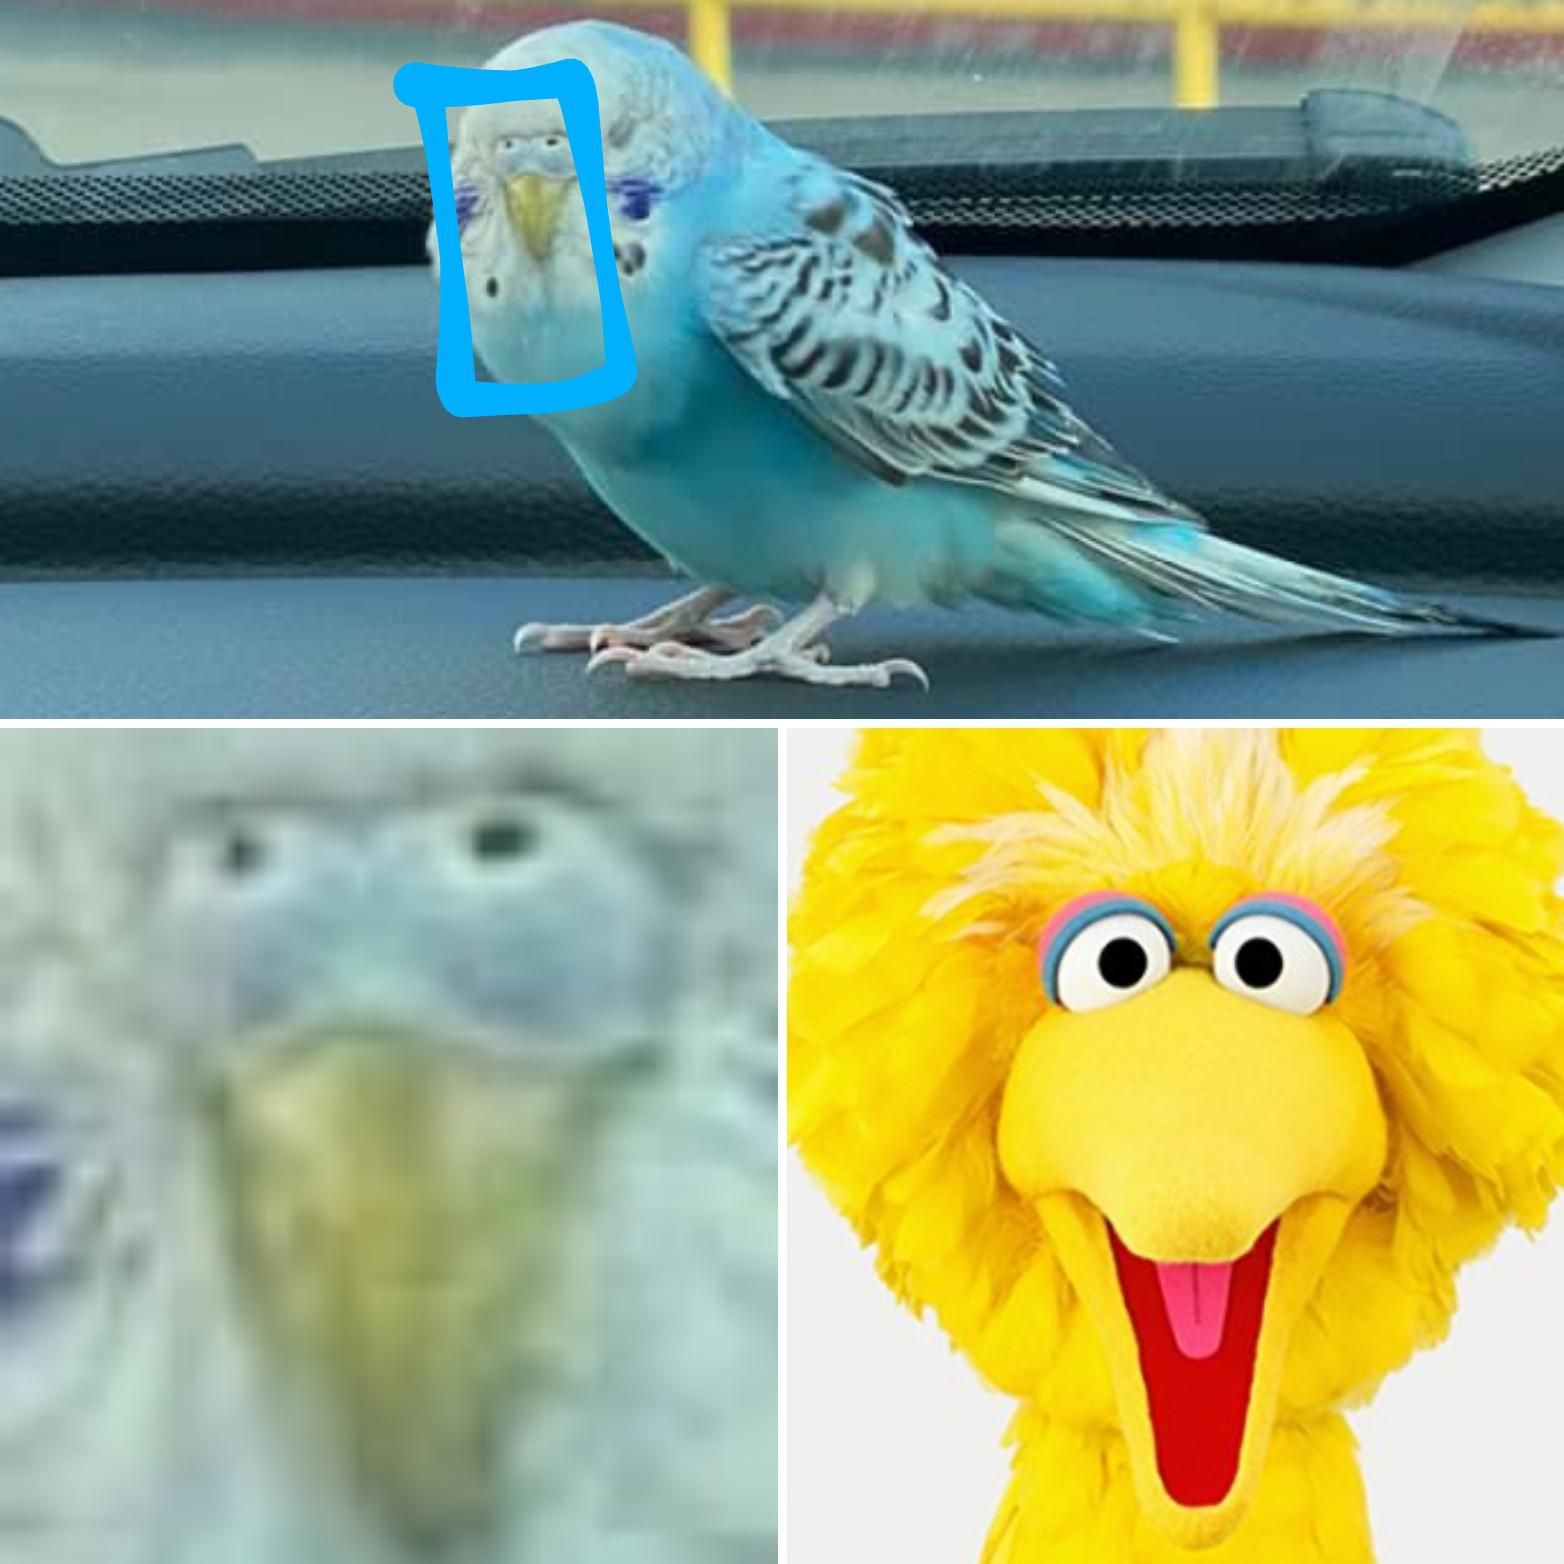 I have discovered the origin of Big Bird